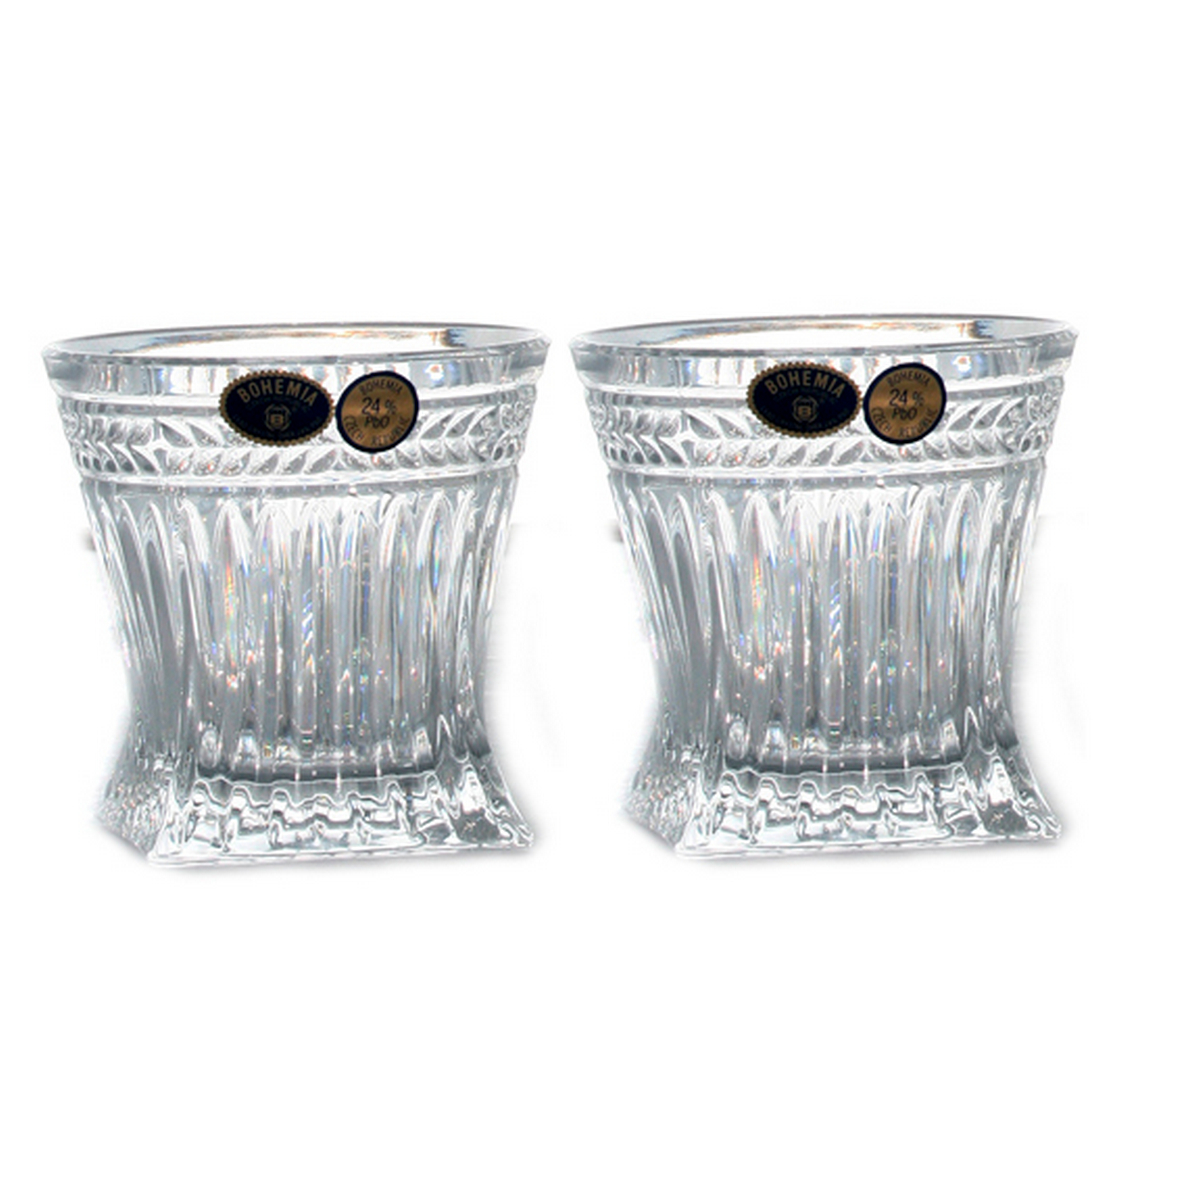 Imperial Set 6 Pahare Cristal Whisky 240 Ml 2021 aranjareamesei.ro